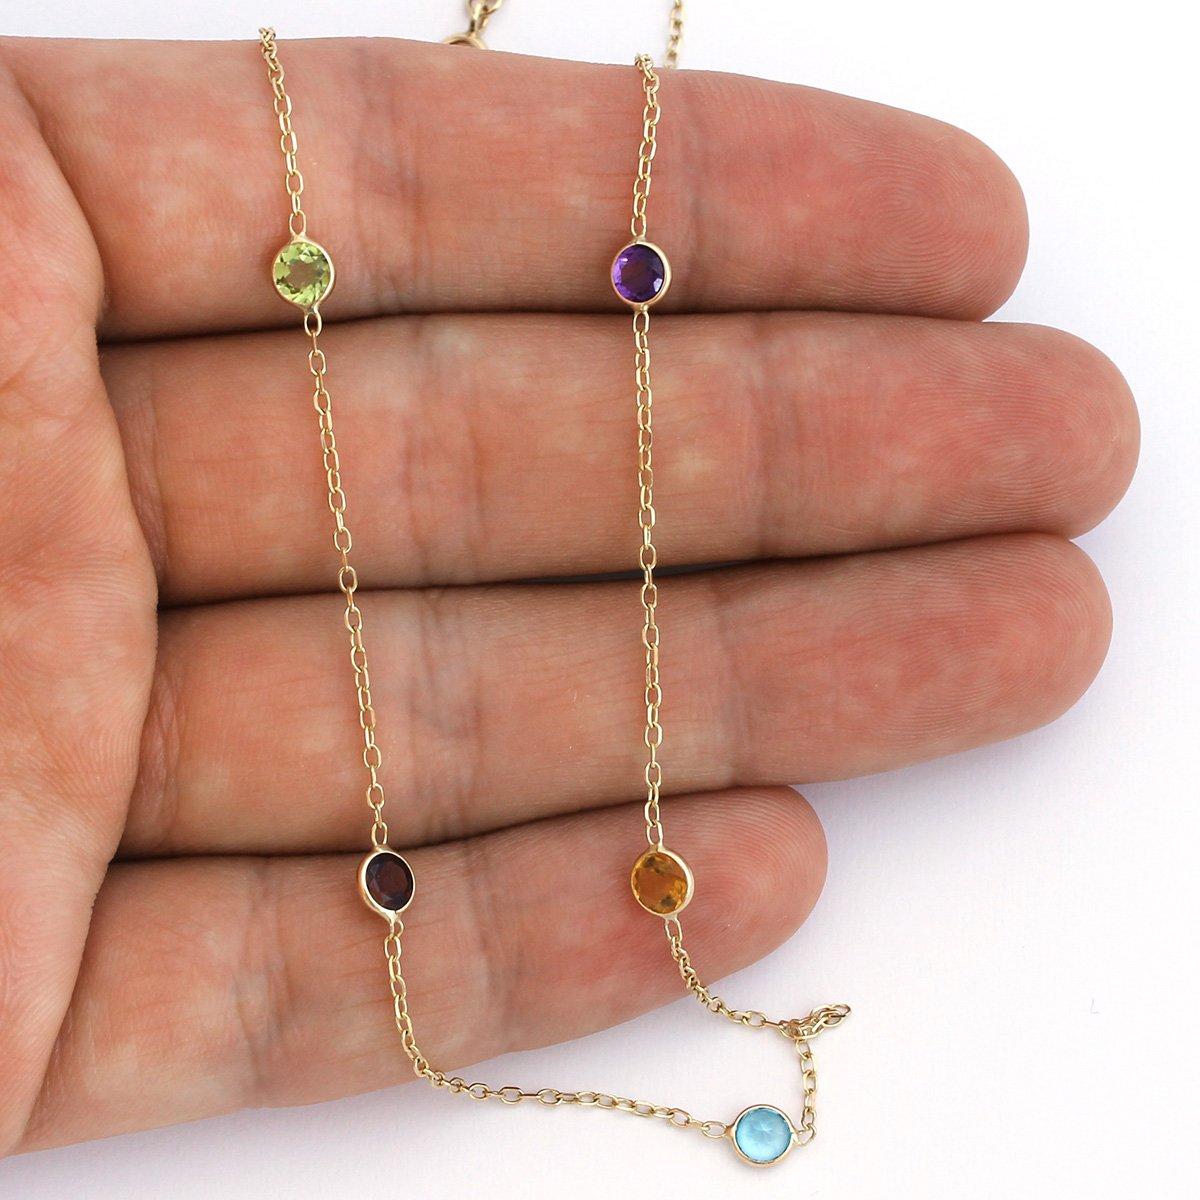 14k Yellow Gold Bezel Set Natural Gemstones Station Necklace, 16'' by Beauniq (Image #4)